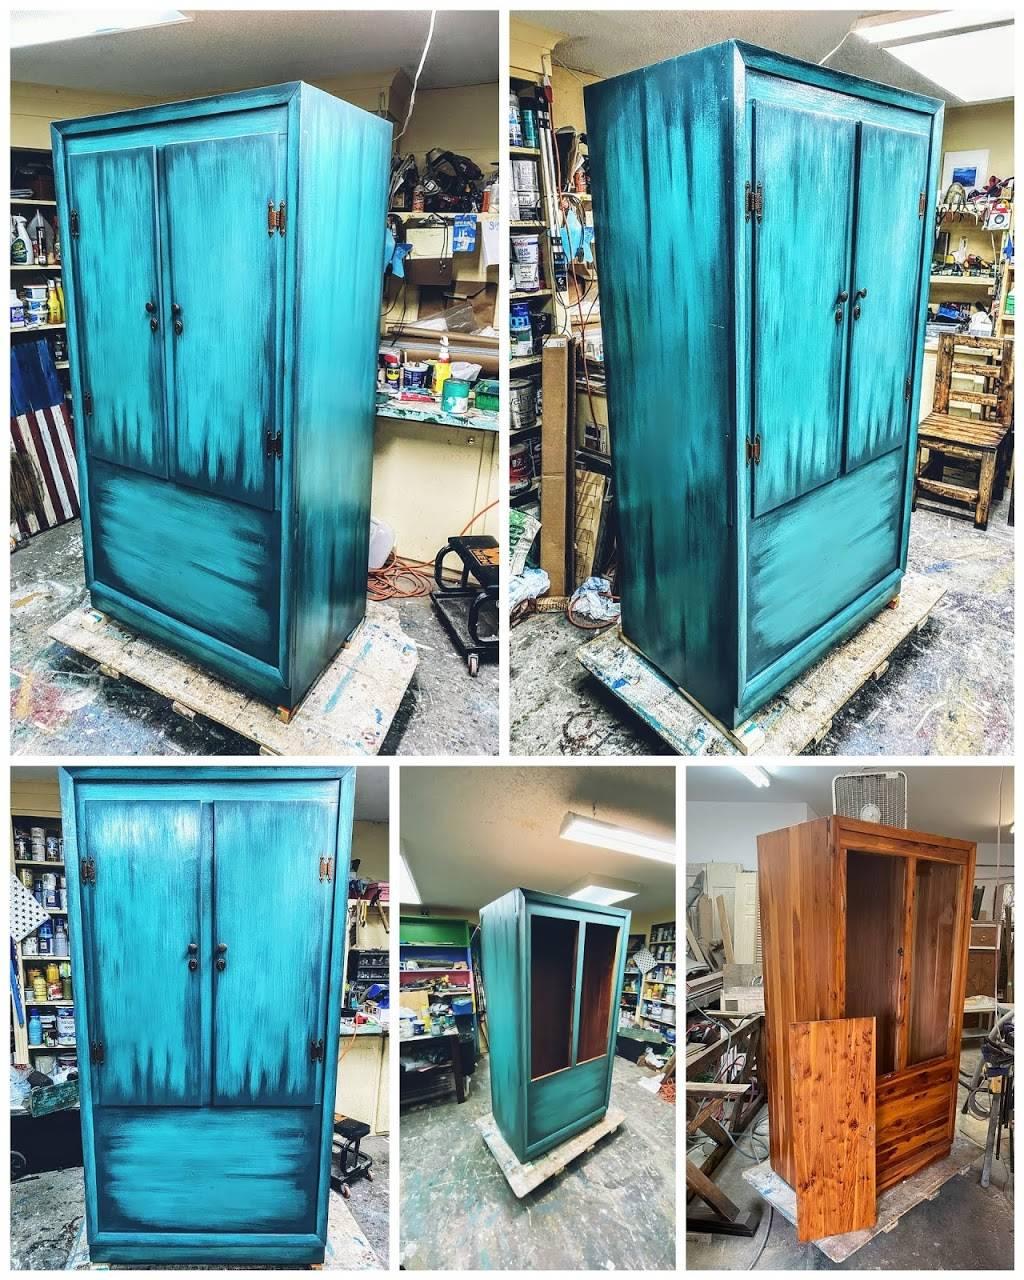 OL 2 NU Custom reclaimed wood rustic coastal farmhouse wood furn - painter  | Photo 8 of 9 | Address: 1749 Virginia Beach Blvd Unit #101, Virginia Beach, VA 23454, USA | Phone: (757) 907-2265